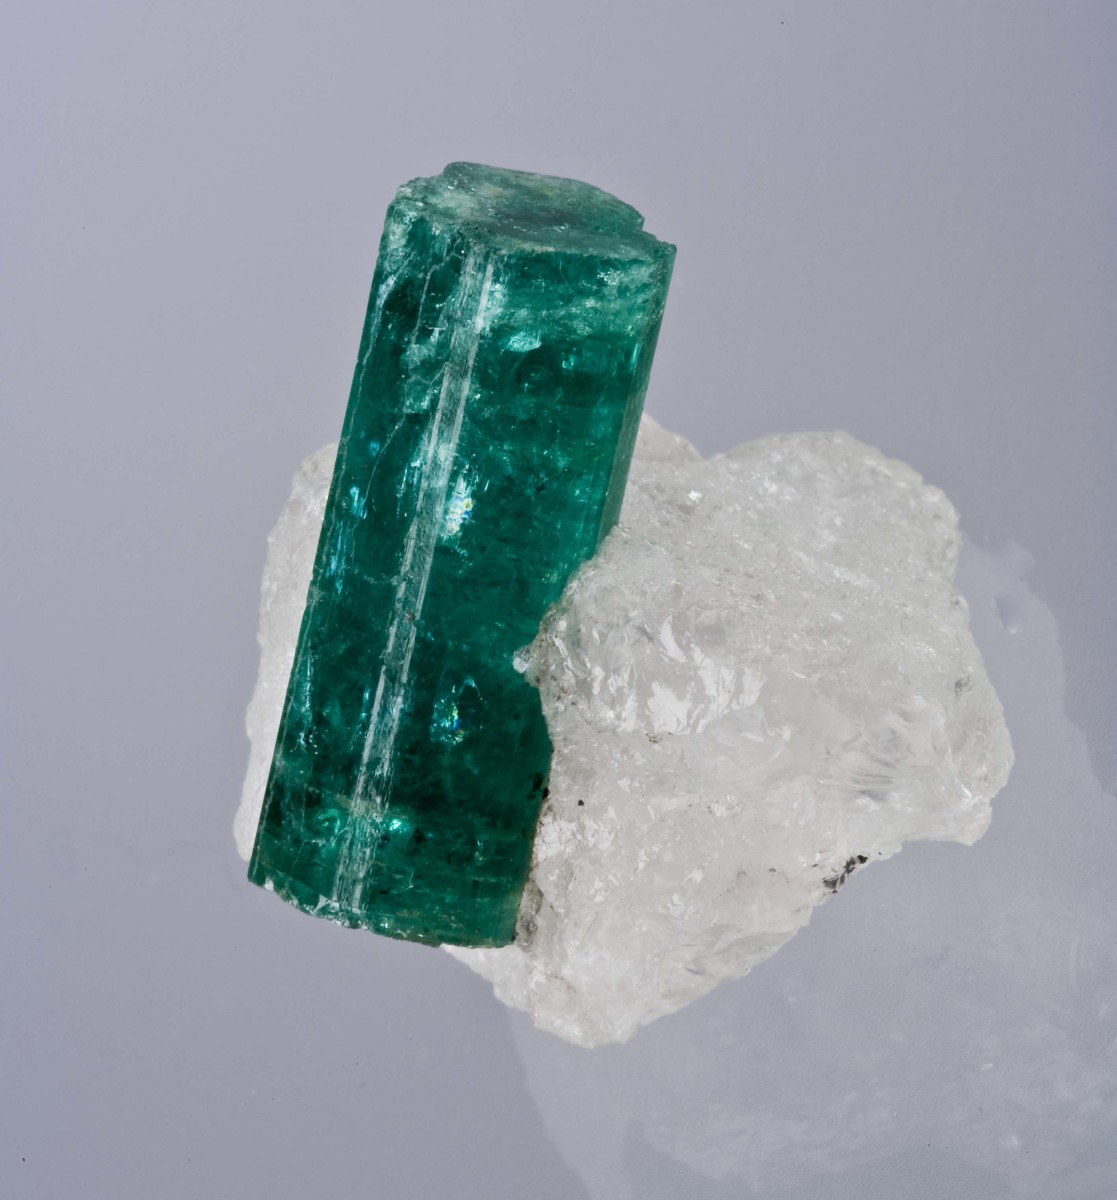 Benefits of Emerald Gemstone | RemedyGrove